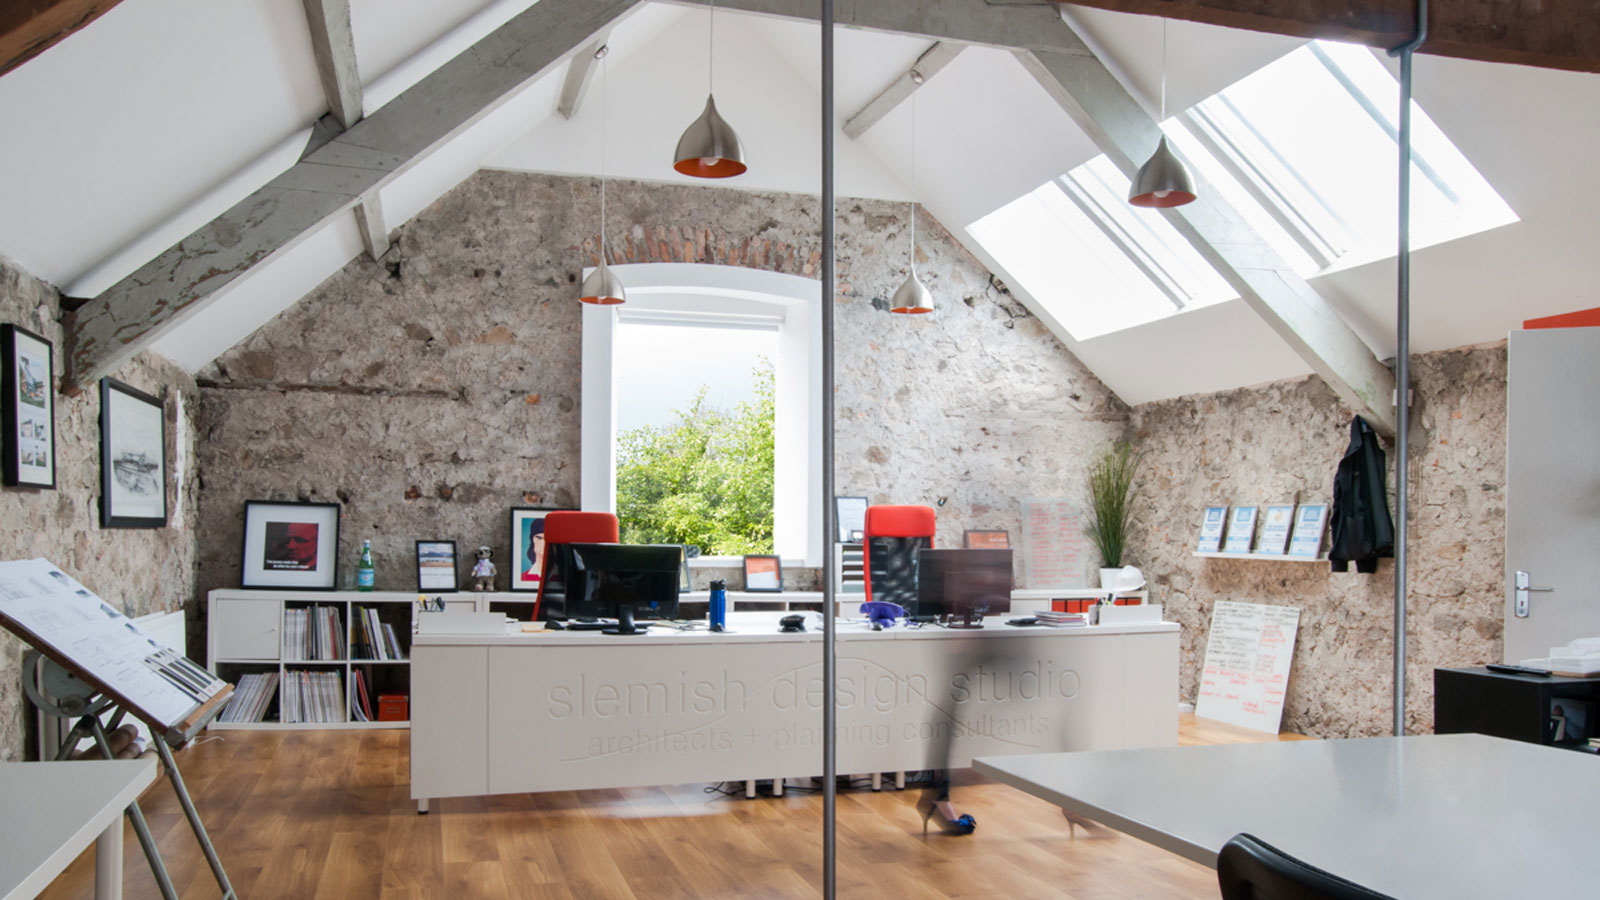 Slemish Design Studio Architects Architecture, Planning U0026 Project Management